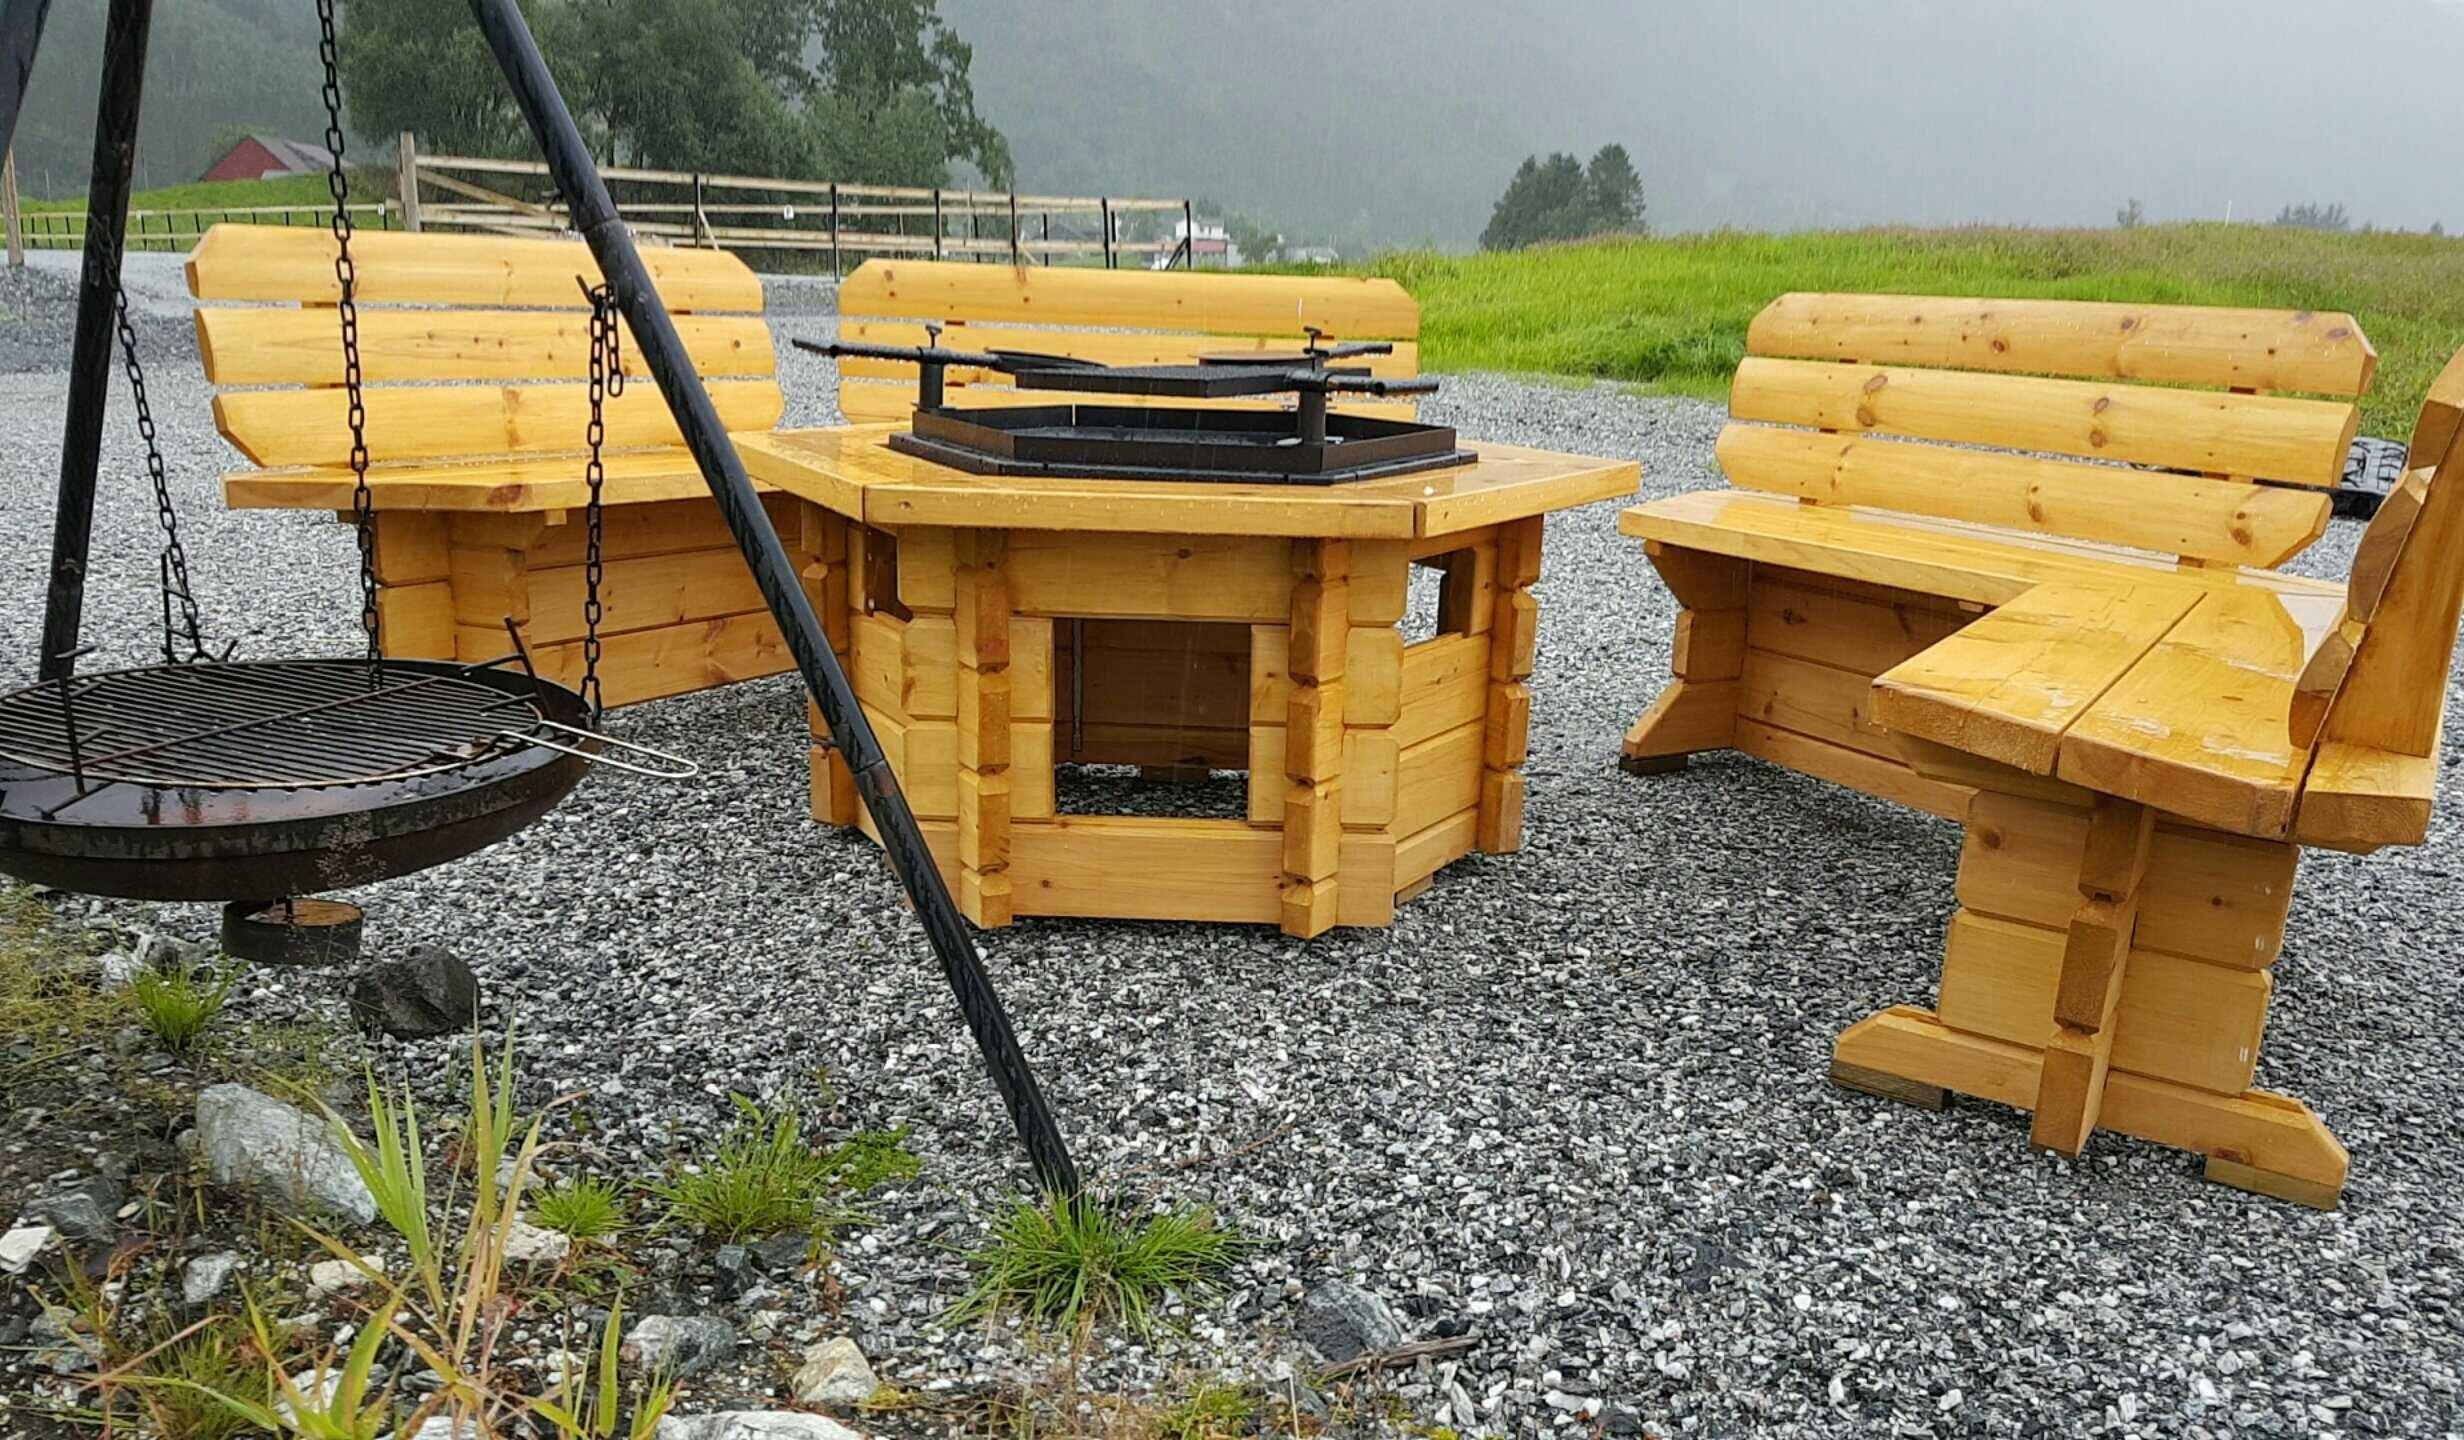 Solneset Gård (Farm) - Motorhome and caravan parking.